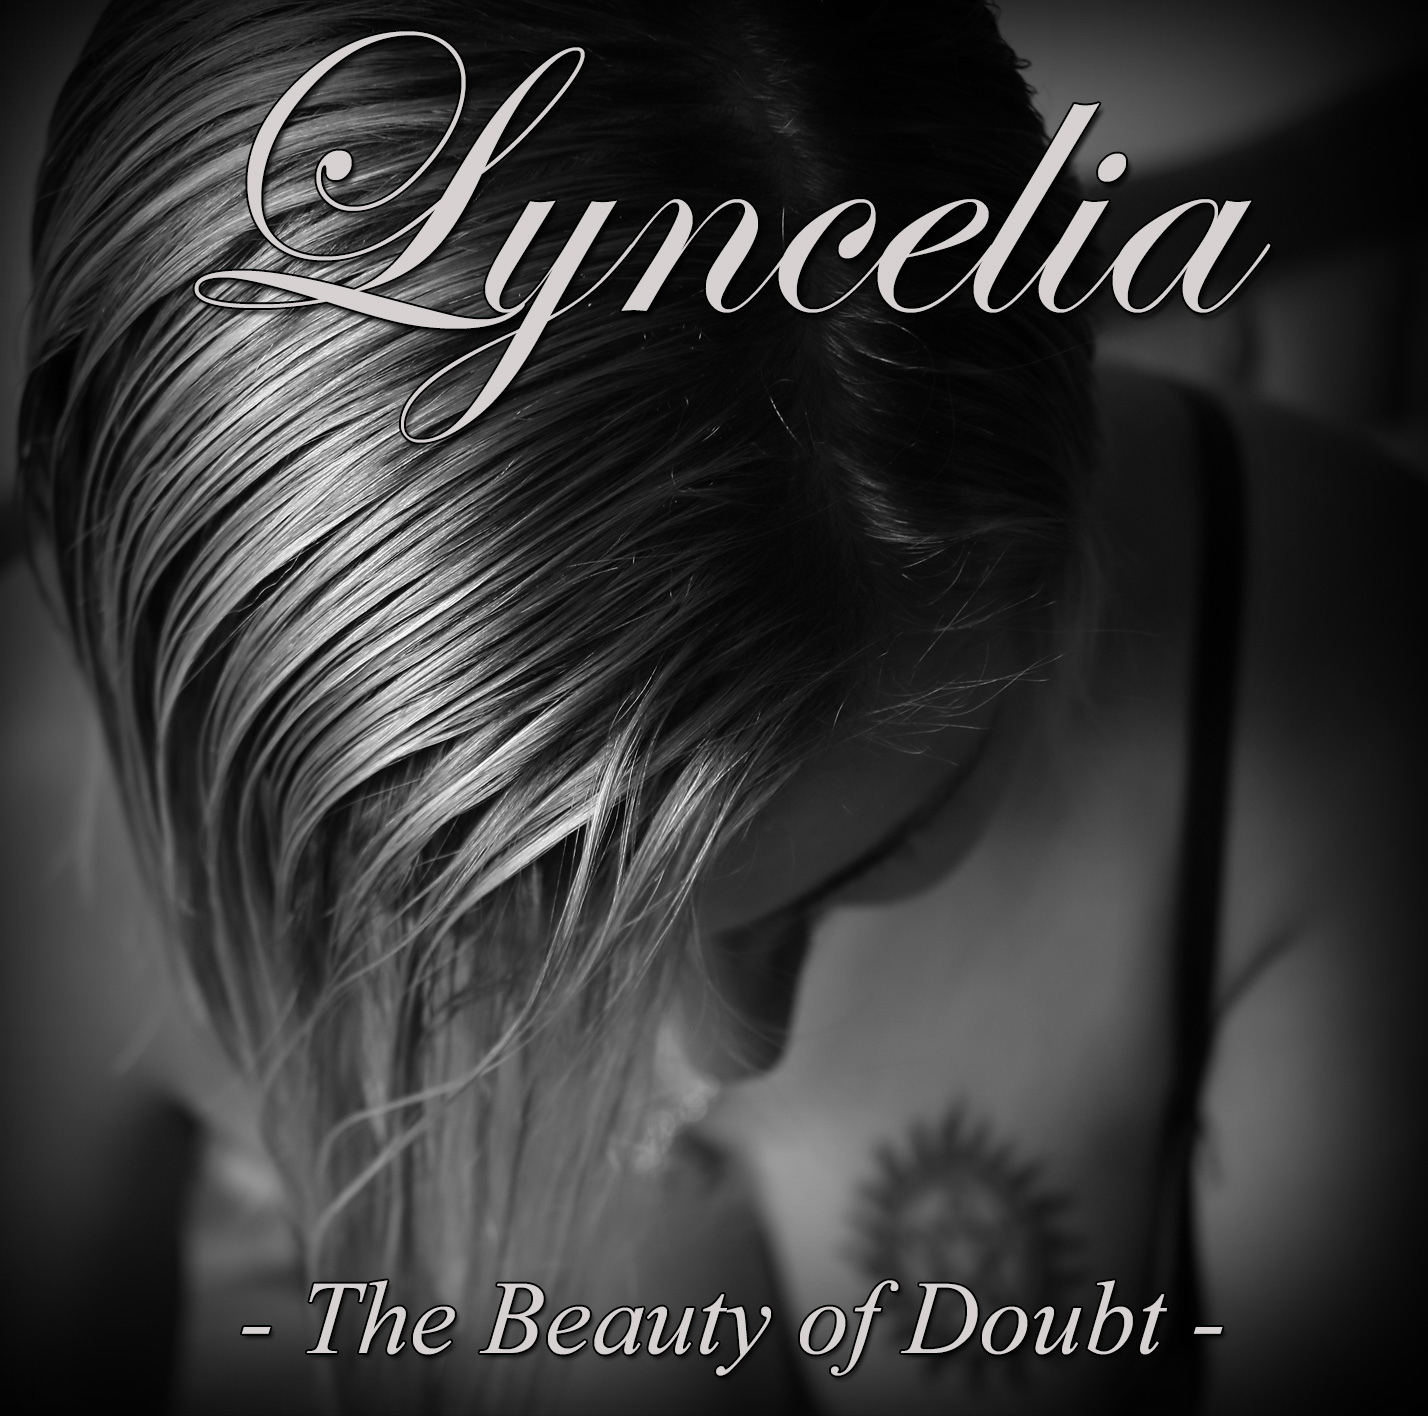 Lyncelia The Beauty of Doubt Cover 2018